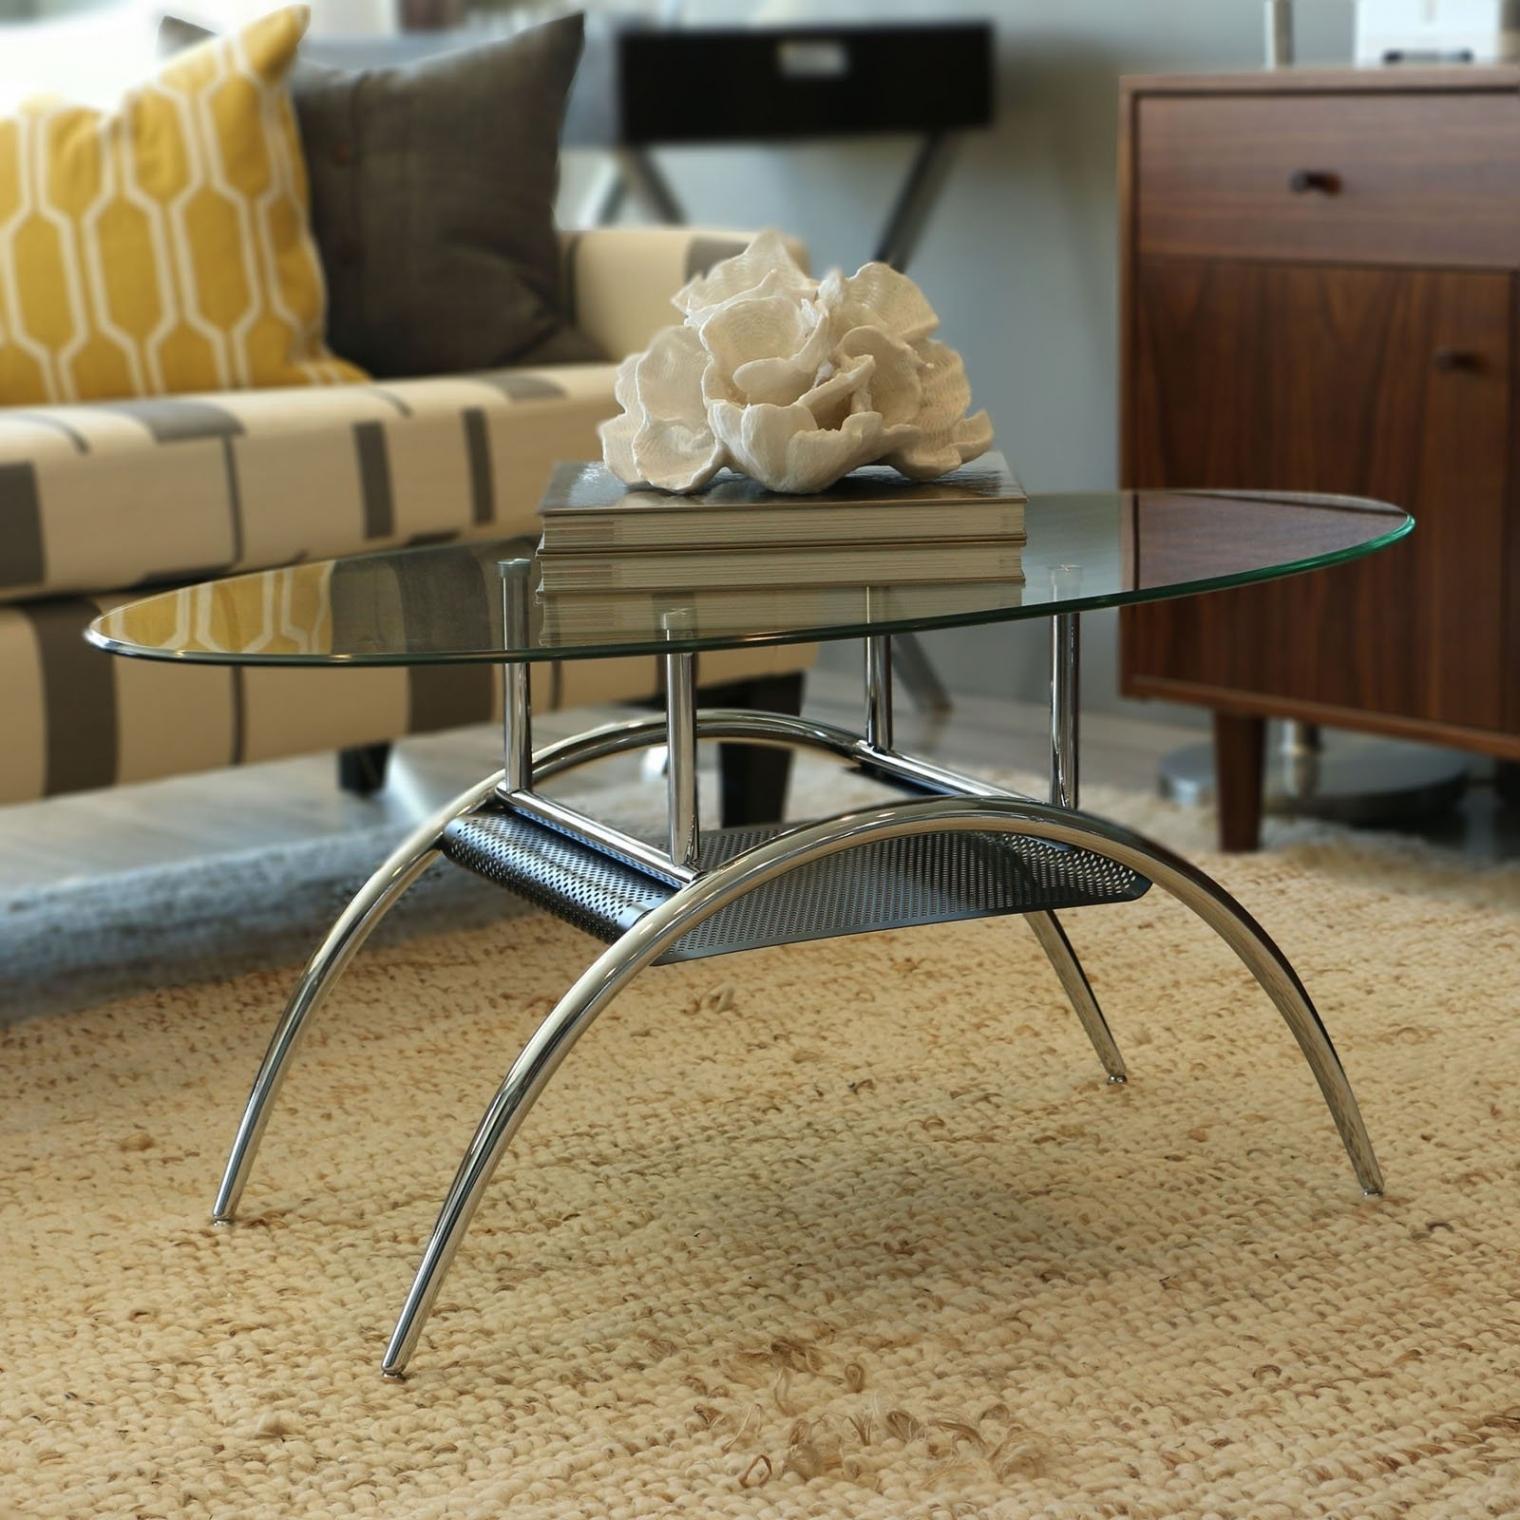 Genova Coffee Table Regarding A Writting Desk Or A Coffee Table?